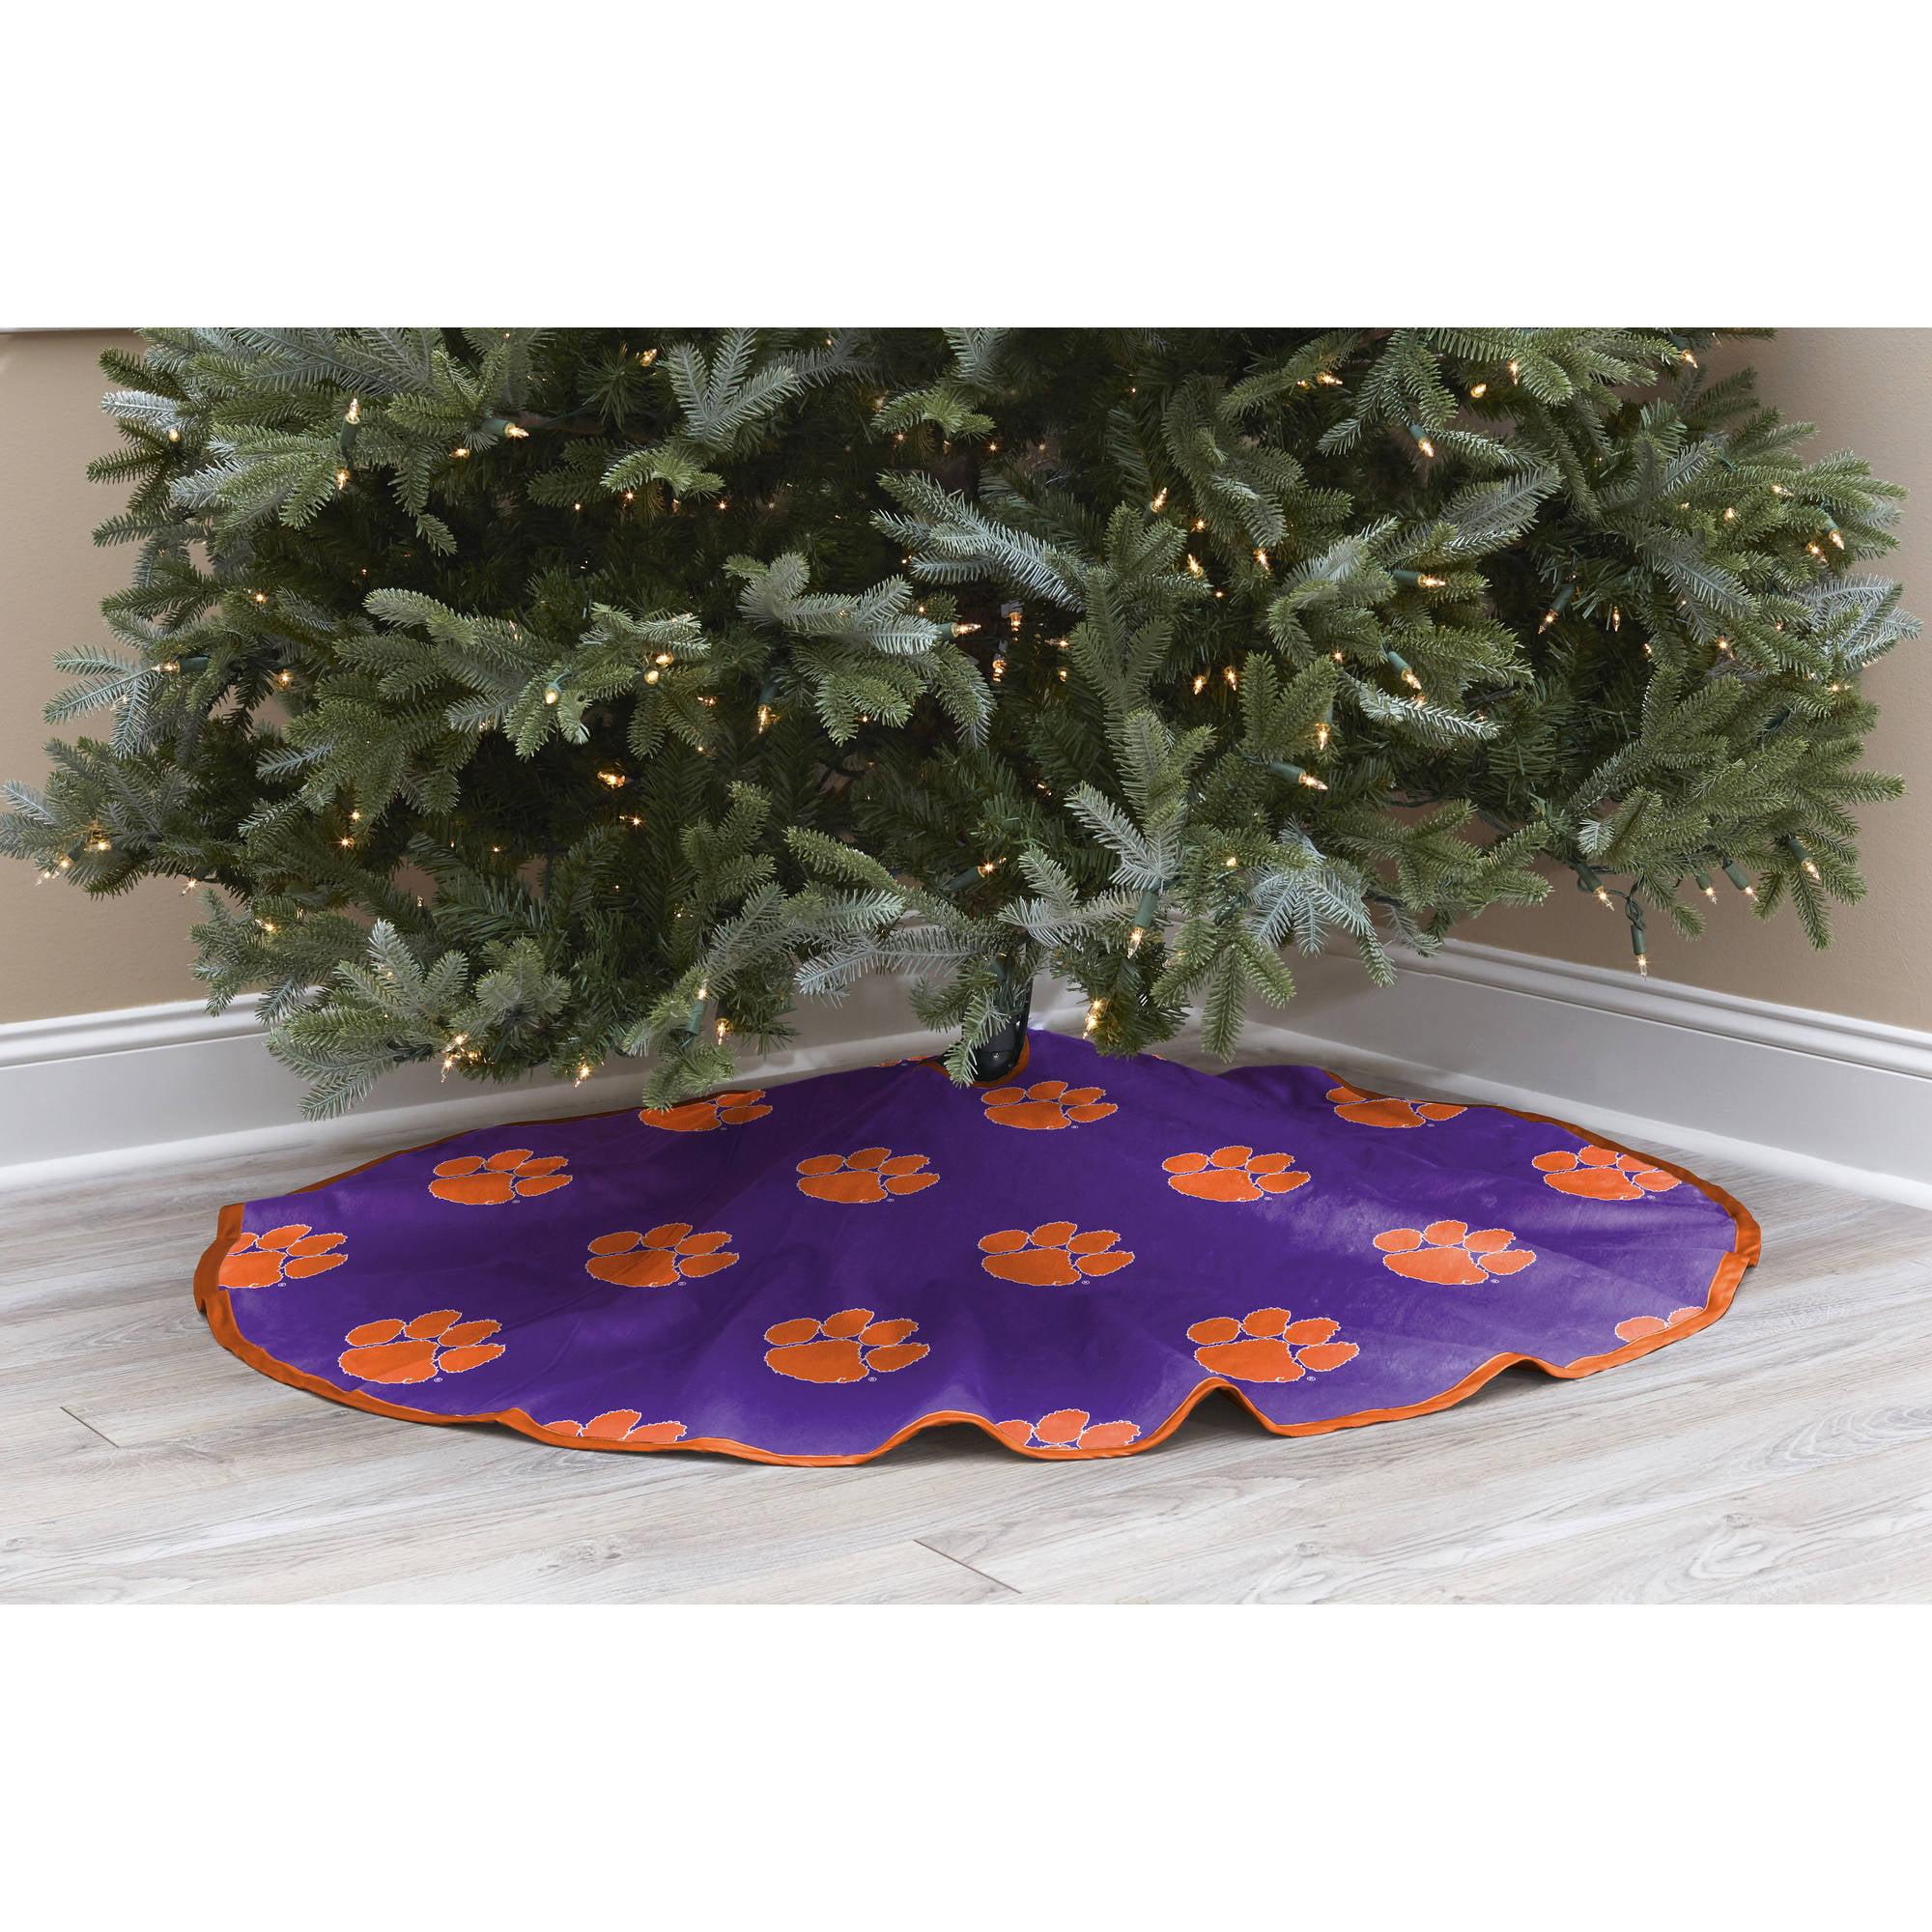 Clemson Christmas Tree: NCAA Licensed Logo Christmas Tree Skirt, Clemson